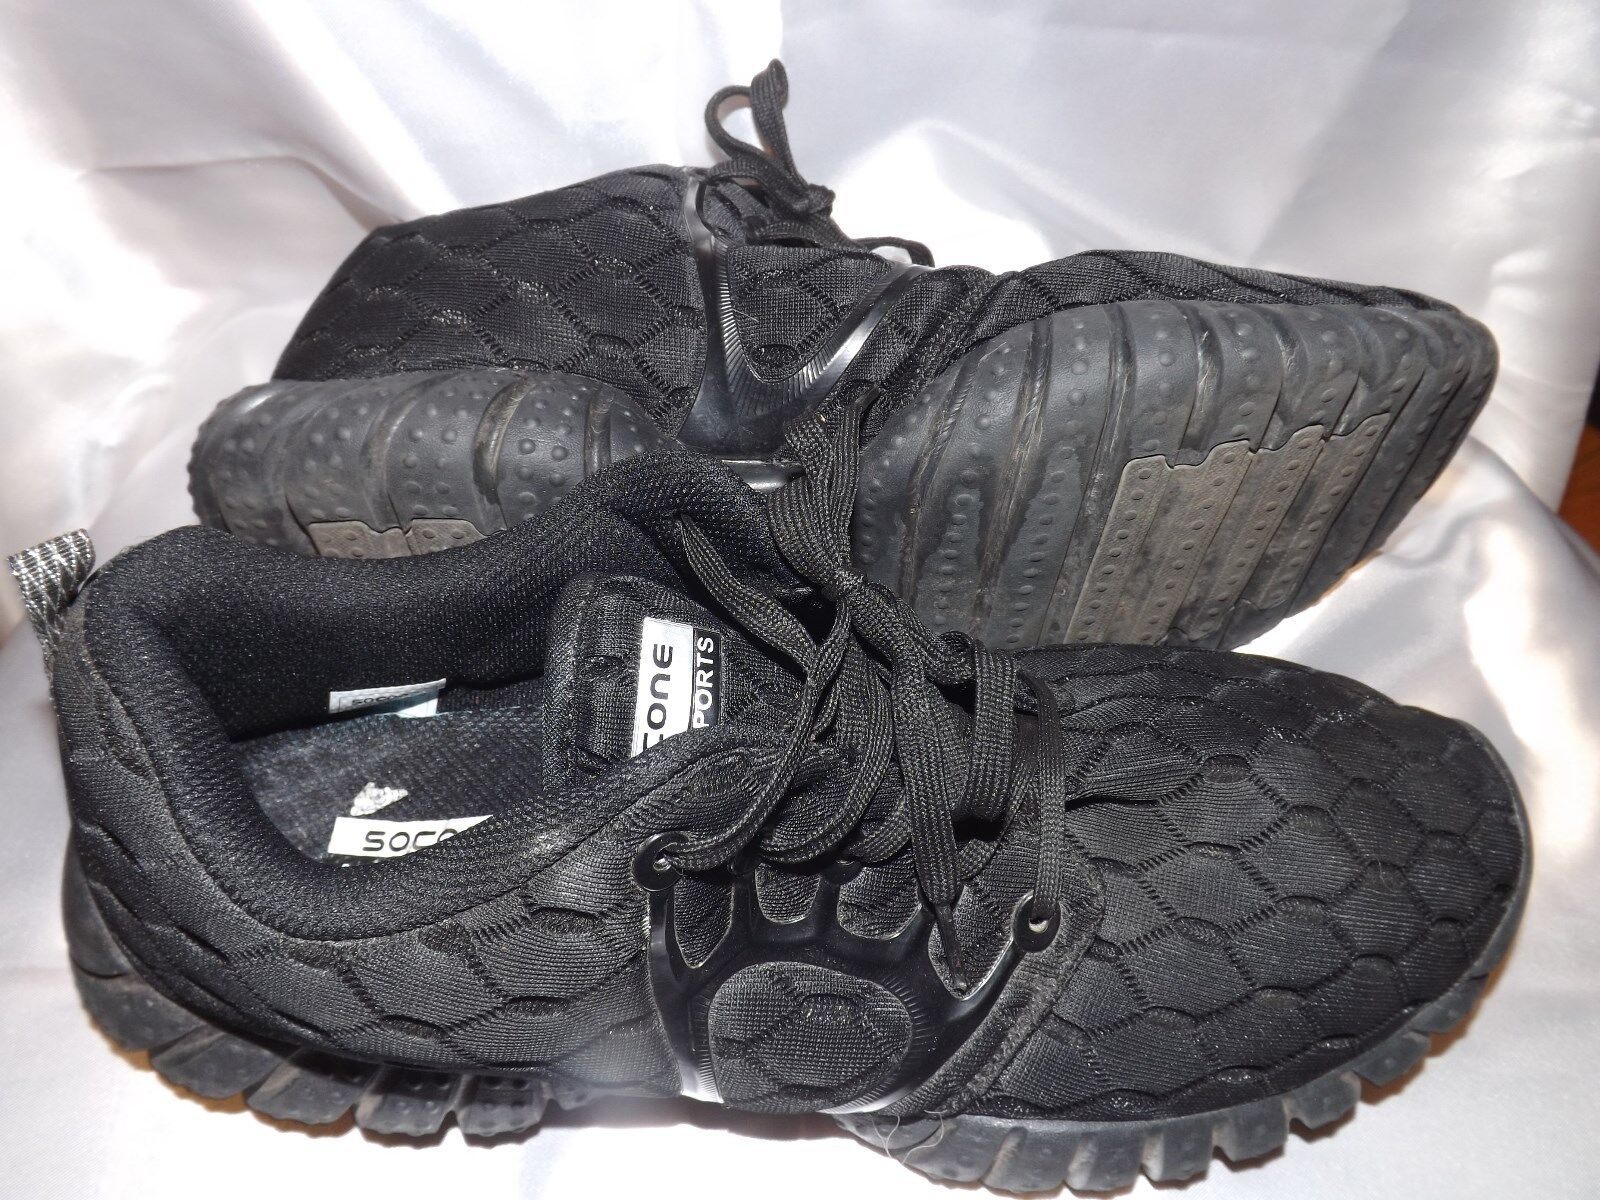 Socone Sport Light Weight Black Textile Upper 11 Training Athletic Sneakers SZ 11 Upper c8acab